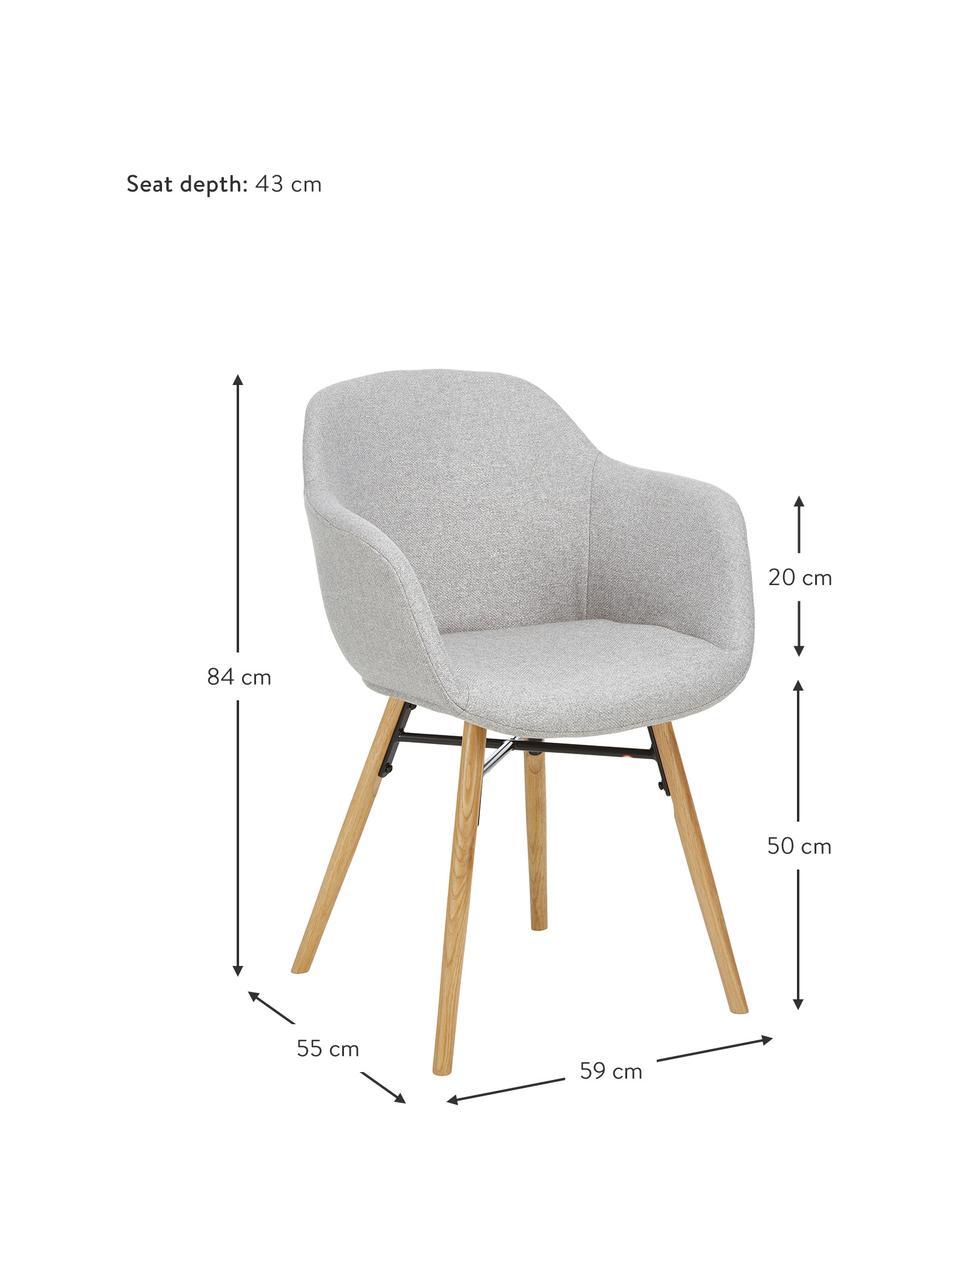 Chaise scandinave Fiji, Tissu gris clair